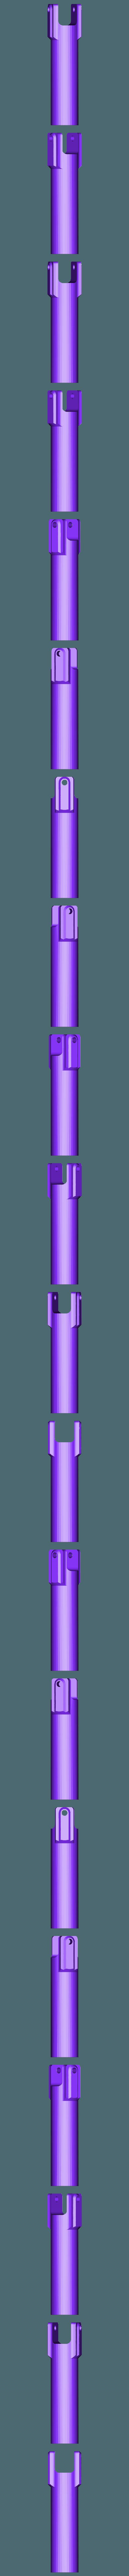 TruckV3_Axle_rear_shaft_Ujoint_C.STL Download STL file 3D Printed RC Truck V3 • 3D print model, MrCrankyface